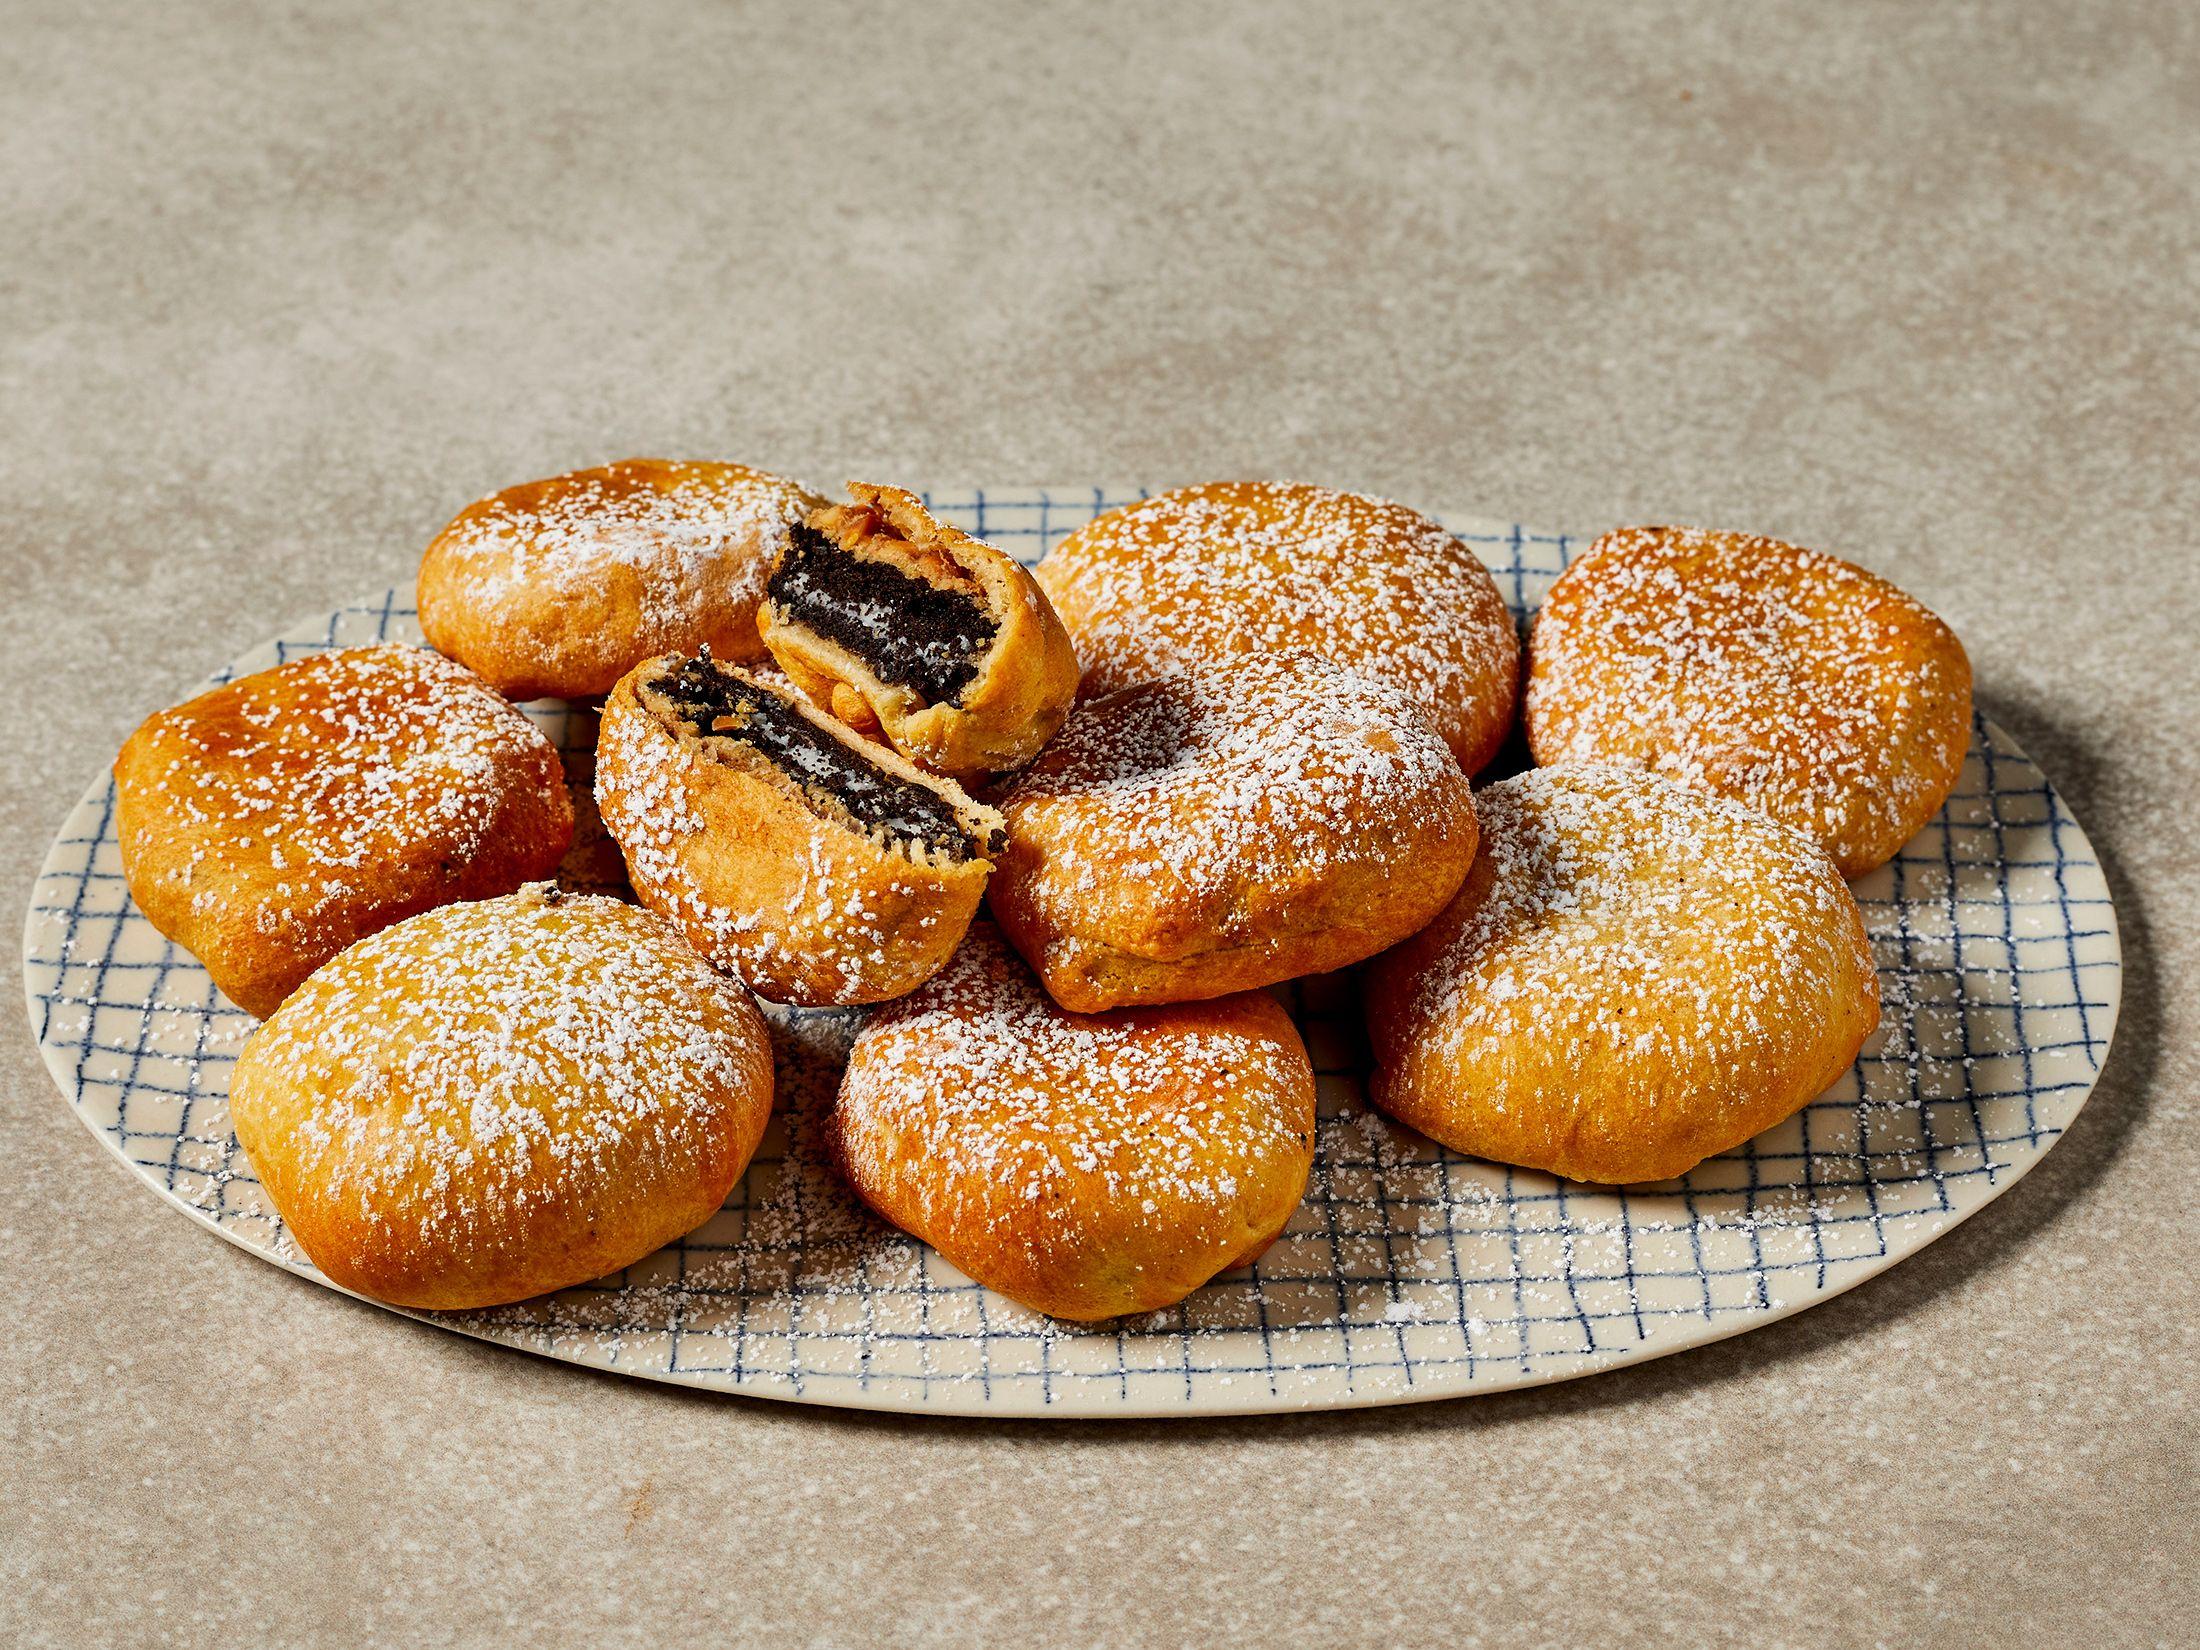 Air Fryer Fried Oreos Recipe In 2020 Air Fried Food Air Fryer